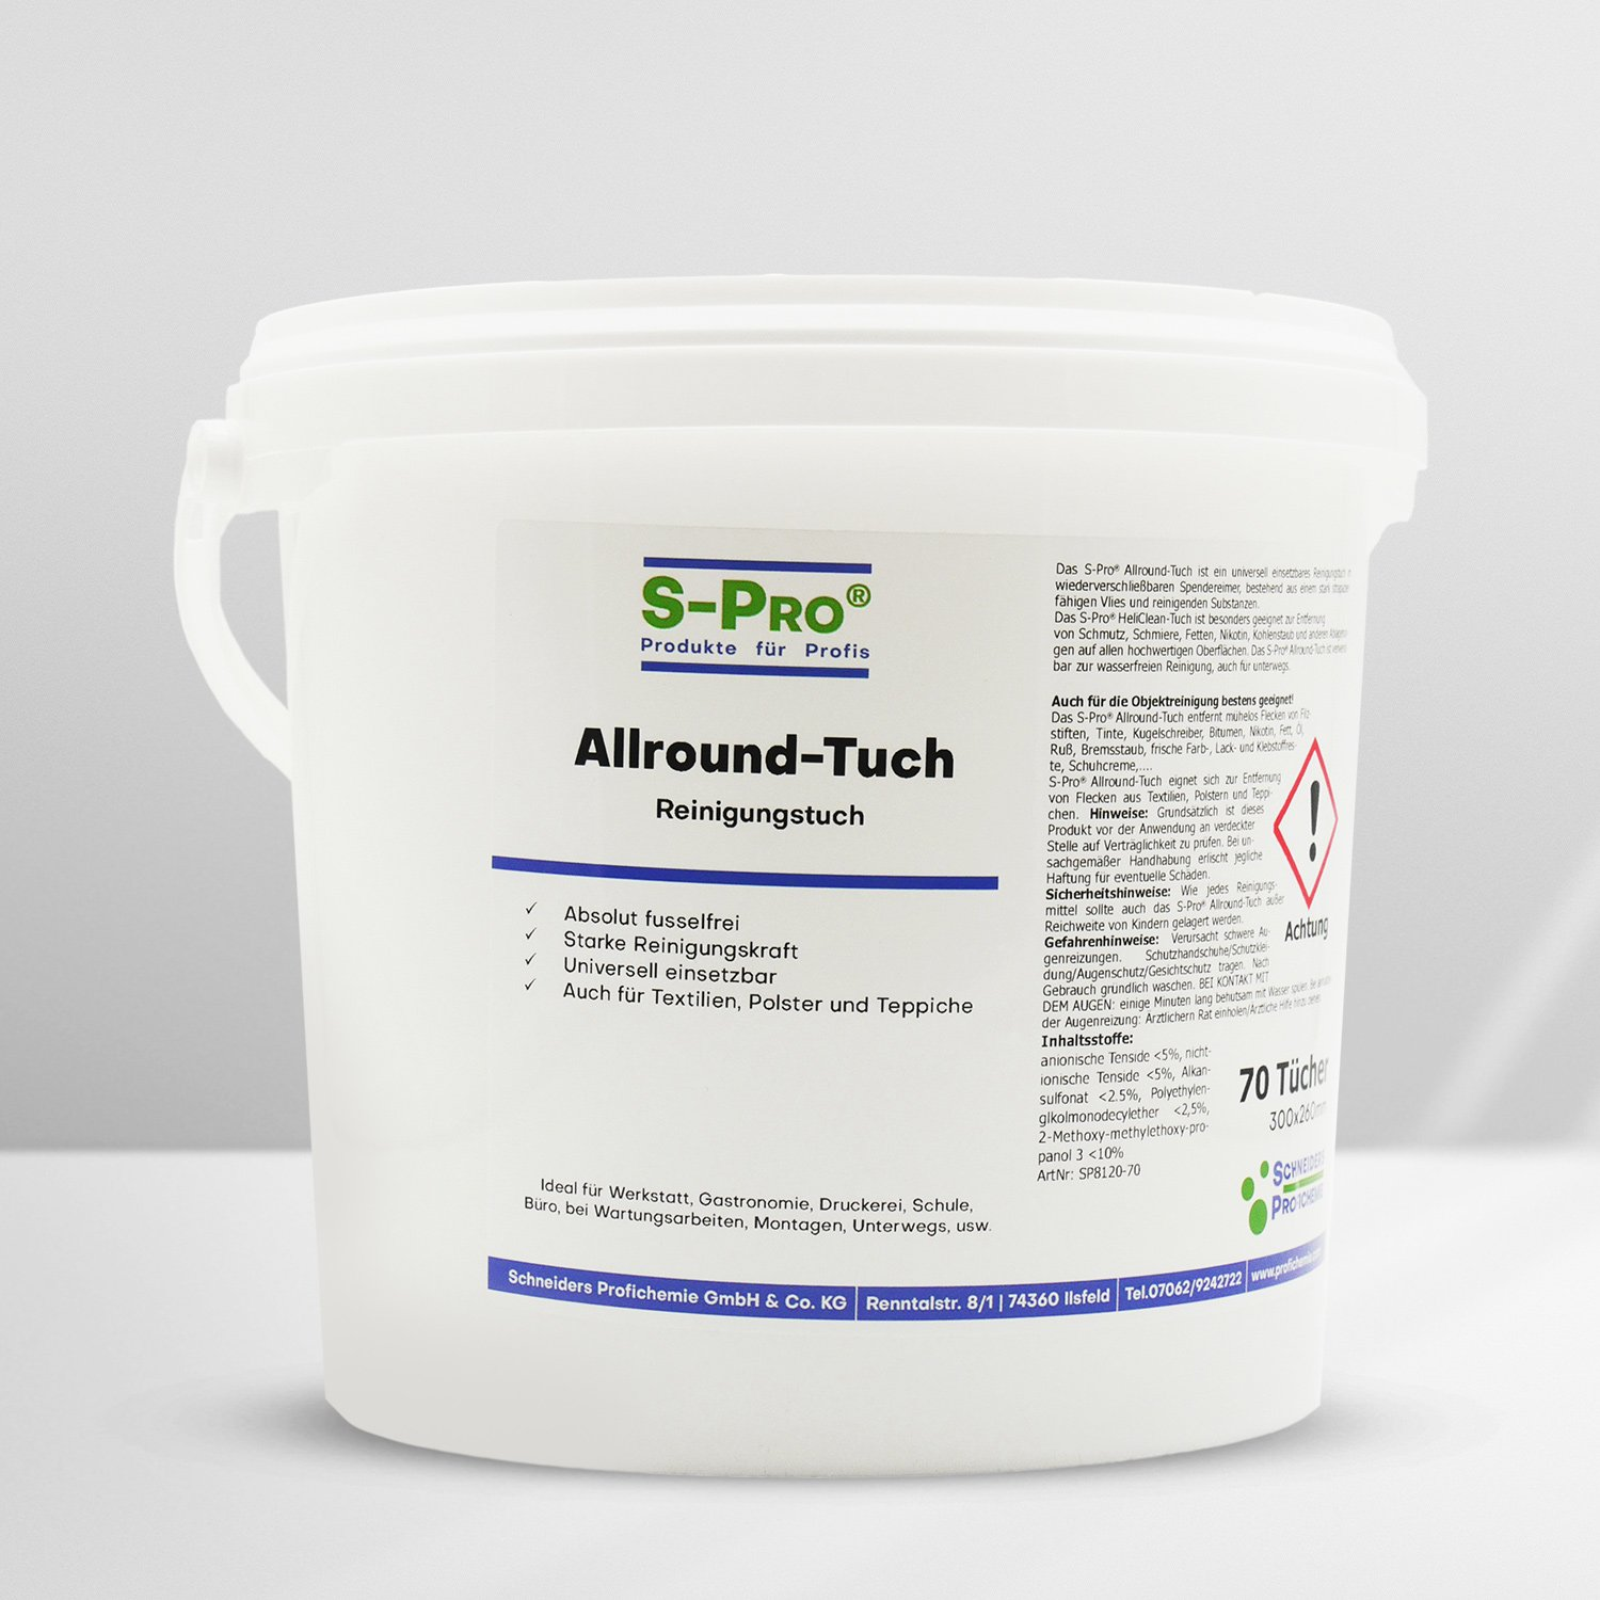 SPro(R) AllroundTuch